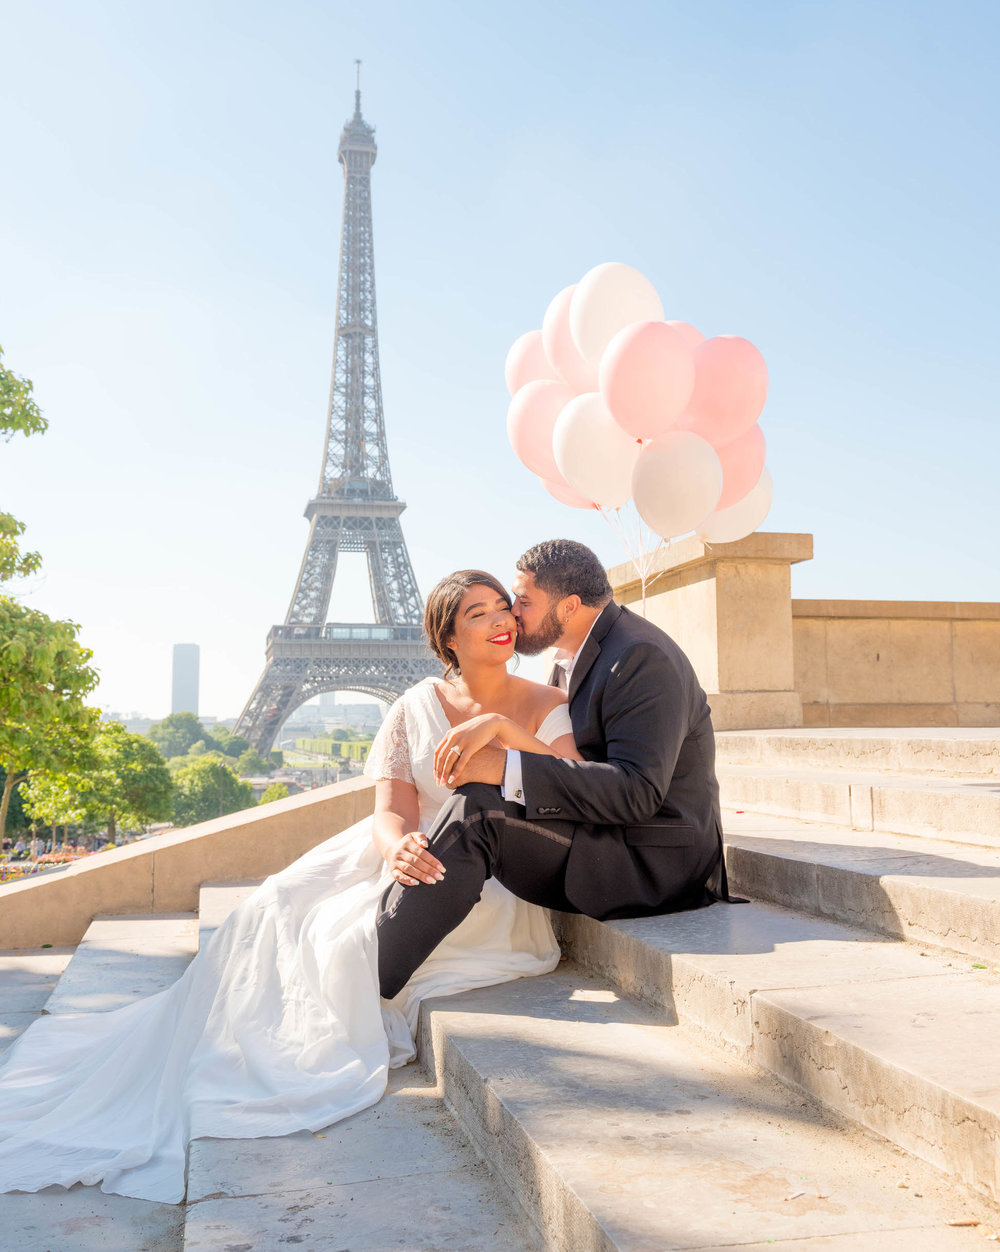 Honeymoon at the Eiffel Tower -